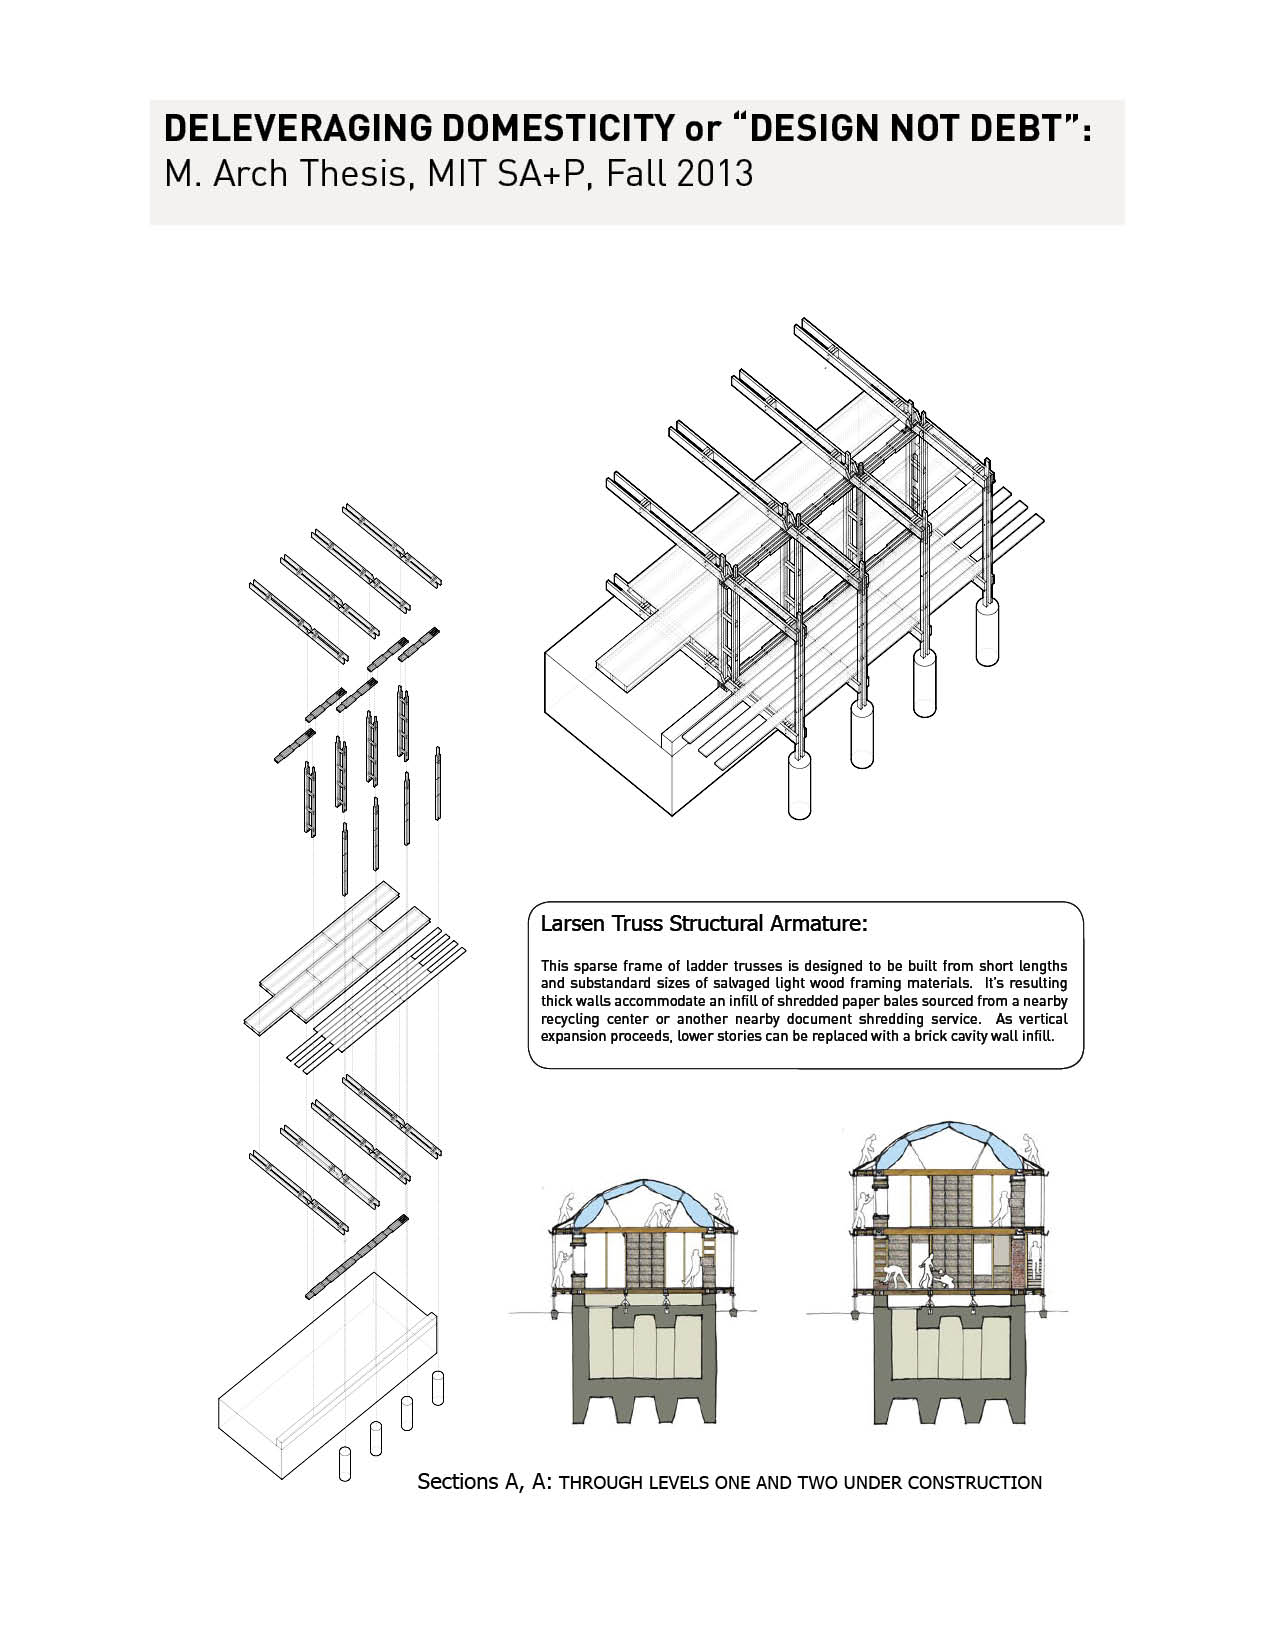 MIT_thesis11.jpg